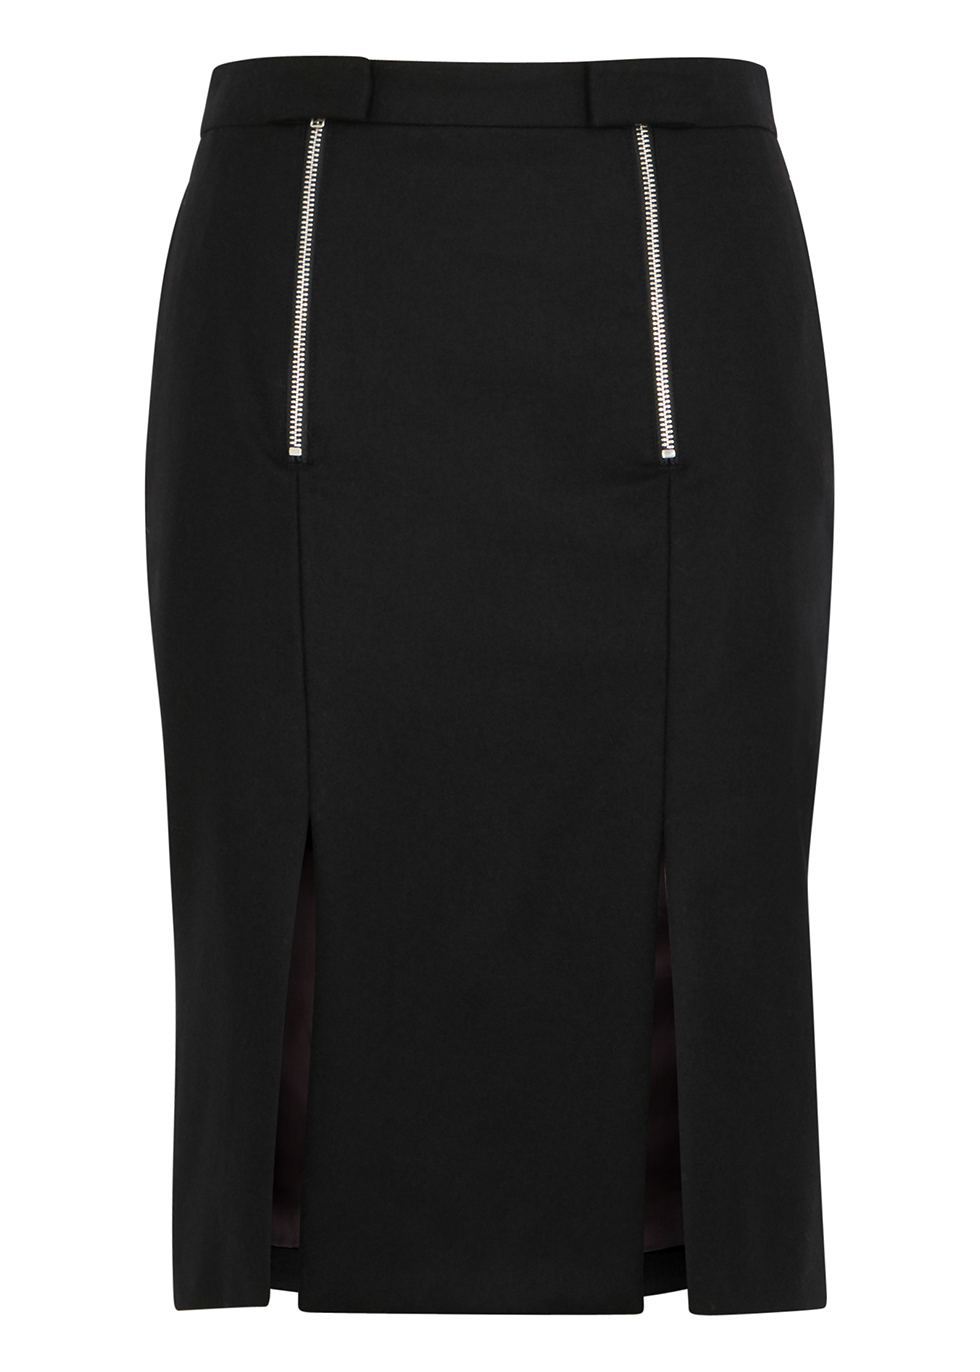 Black brushed wool pencil skirt